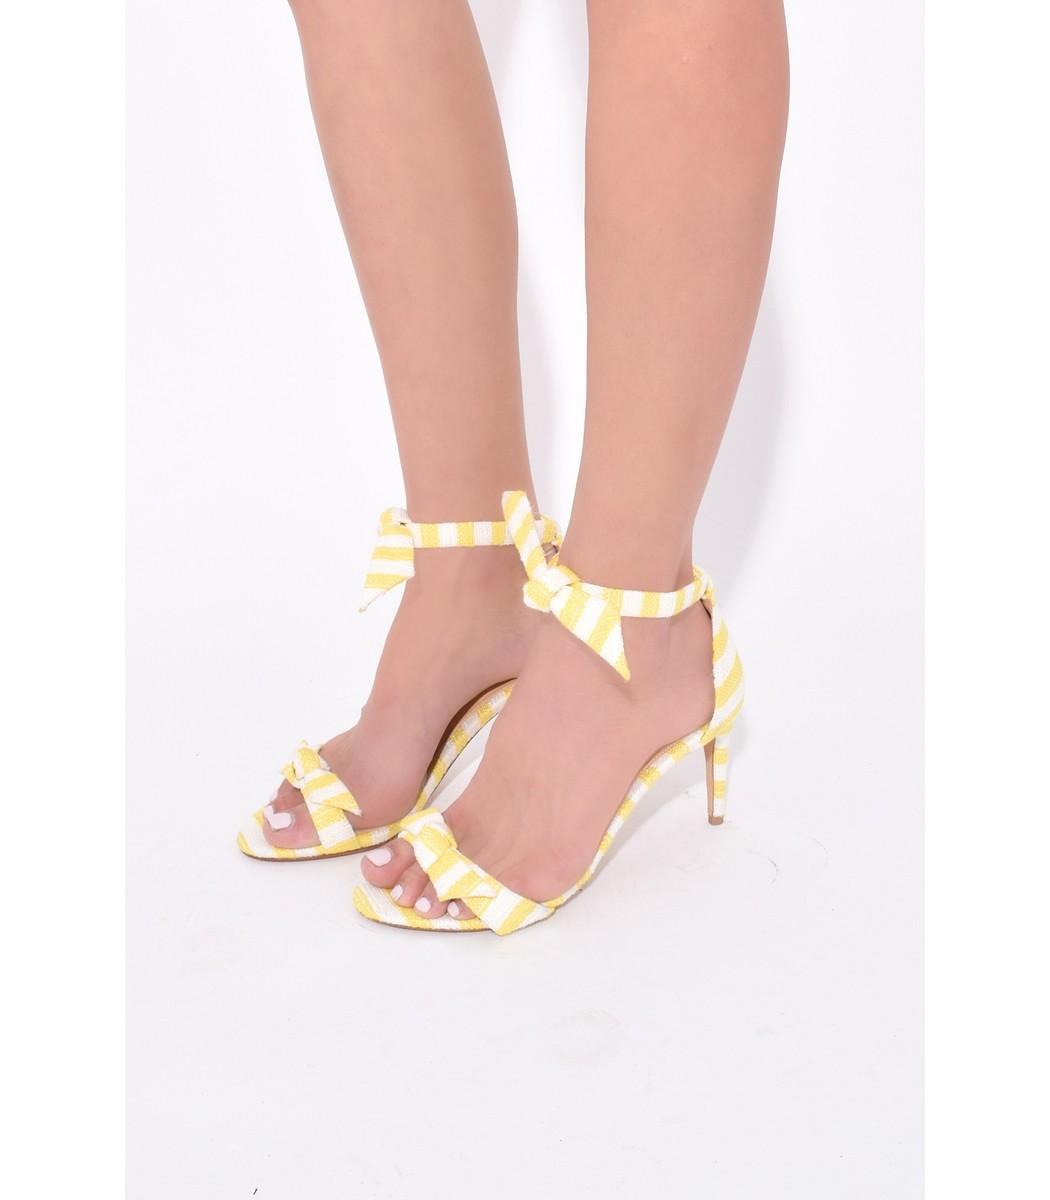 8b15854b008 Alexandre Birman Clarita Heel in Sunflower - ShopBAZAAR